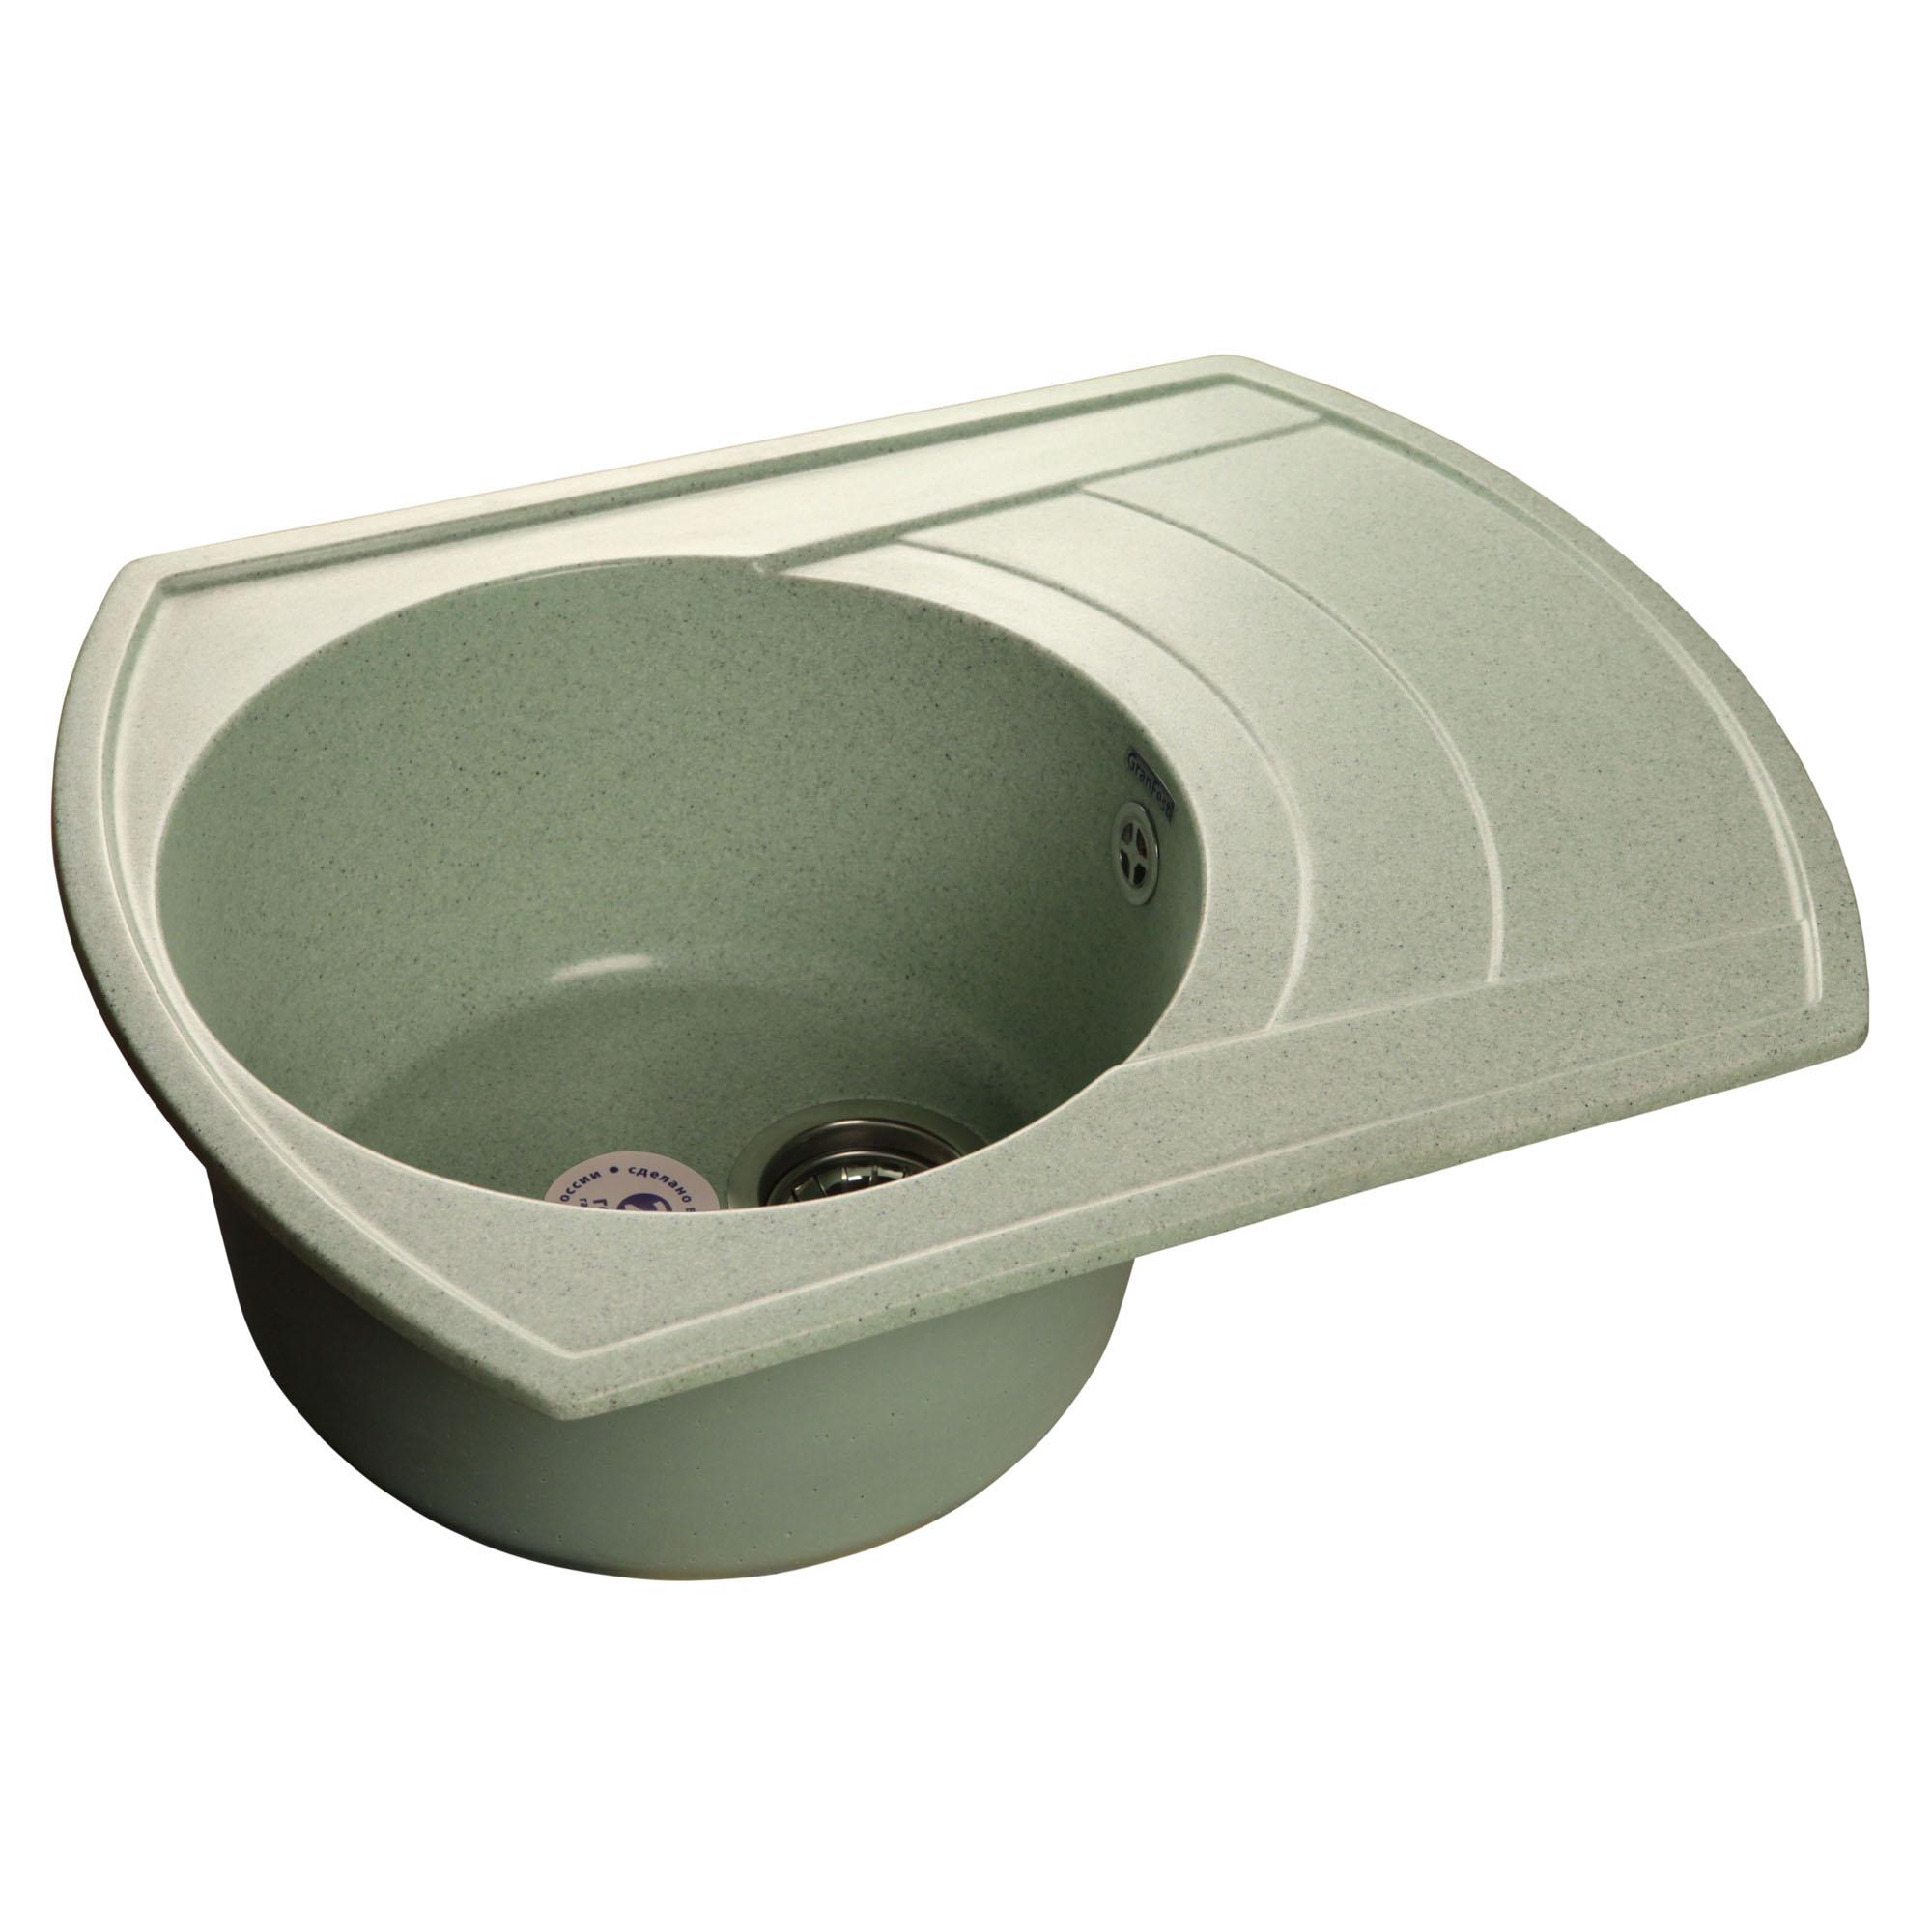 Кухонная мойка GranFest Rondo GF-R650L салатовый мойка кухонная granfest гранит 650x500 чаша крыло gf r650l черная